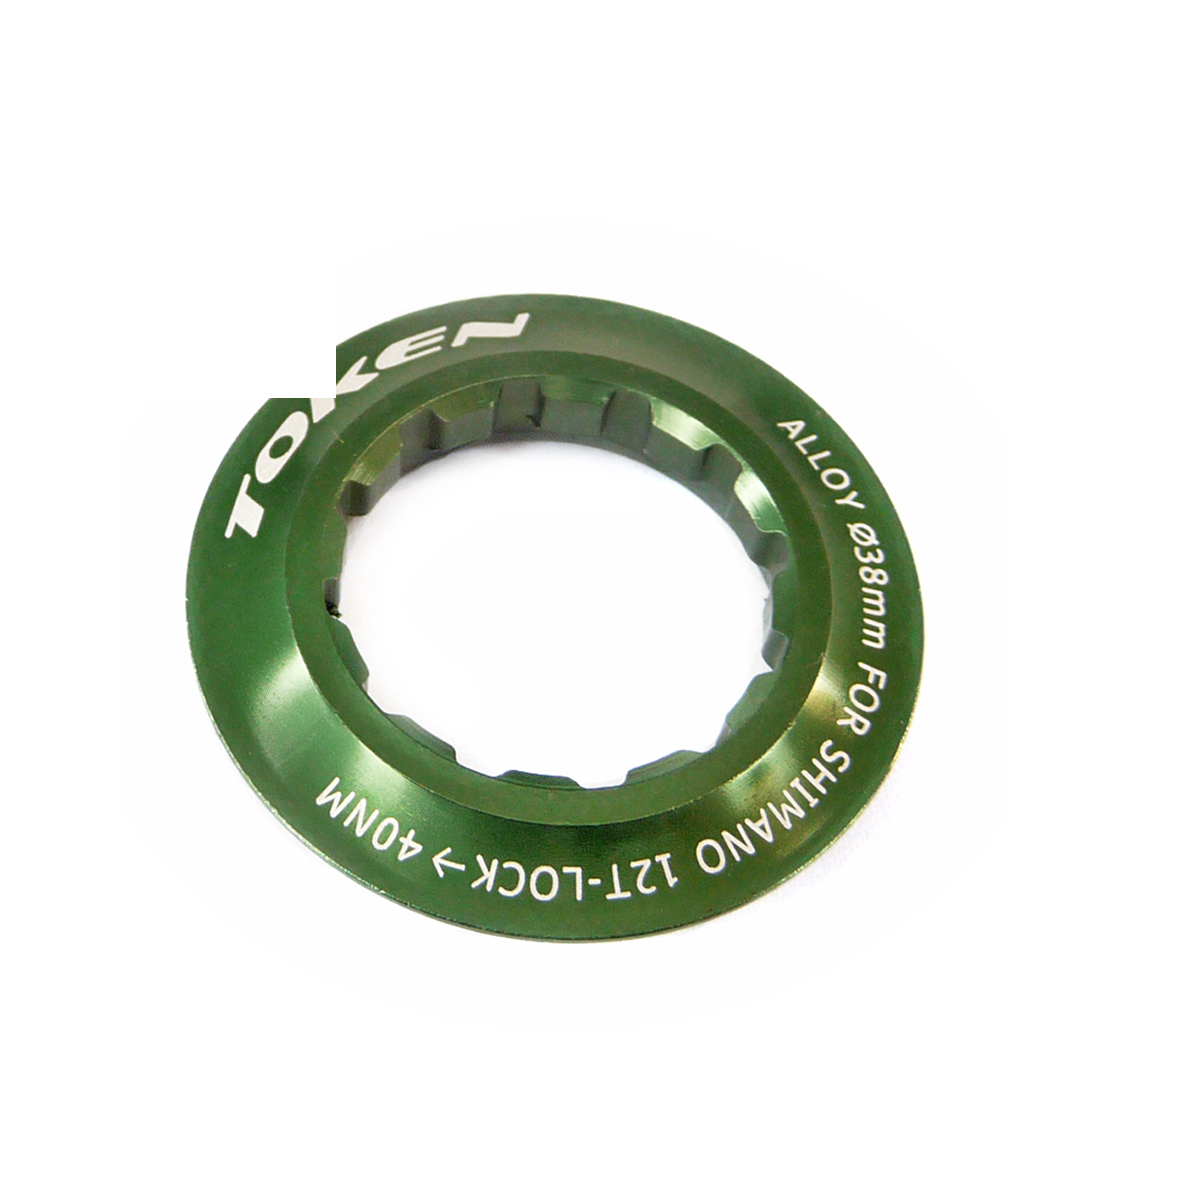 Écrou de cassette Token Shimano 12 dents vert